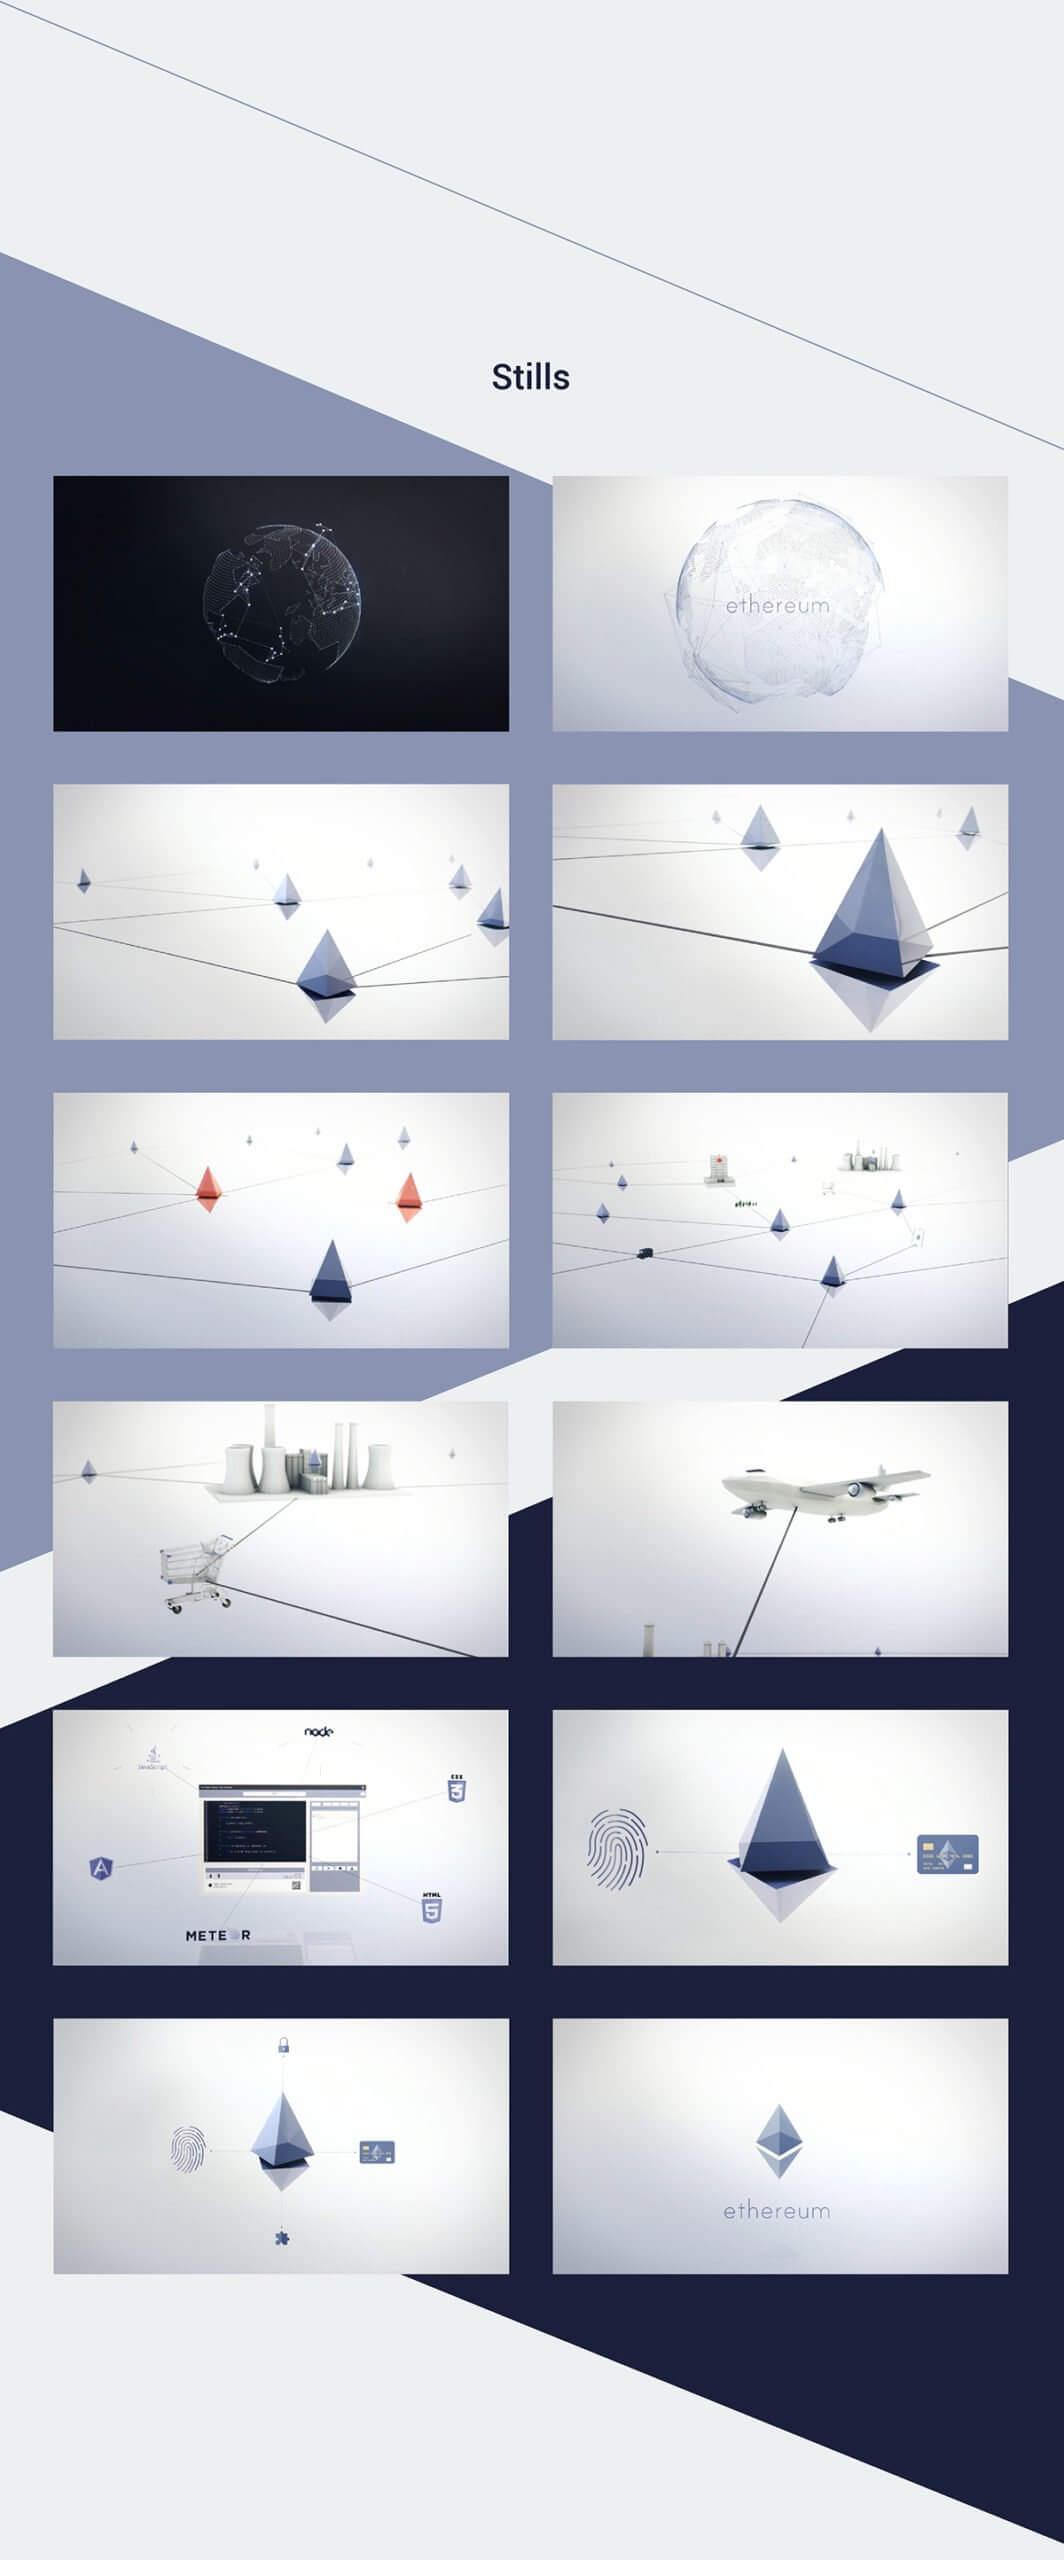 ethereum explainer content stills imagery